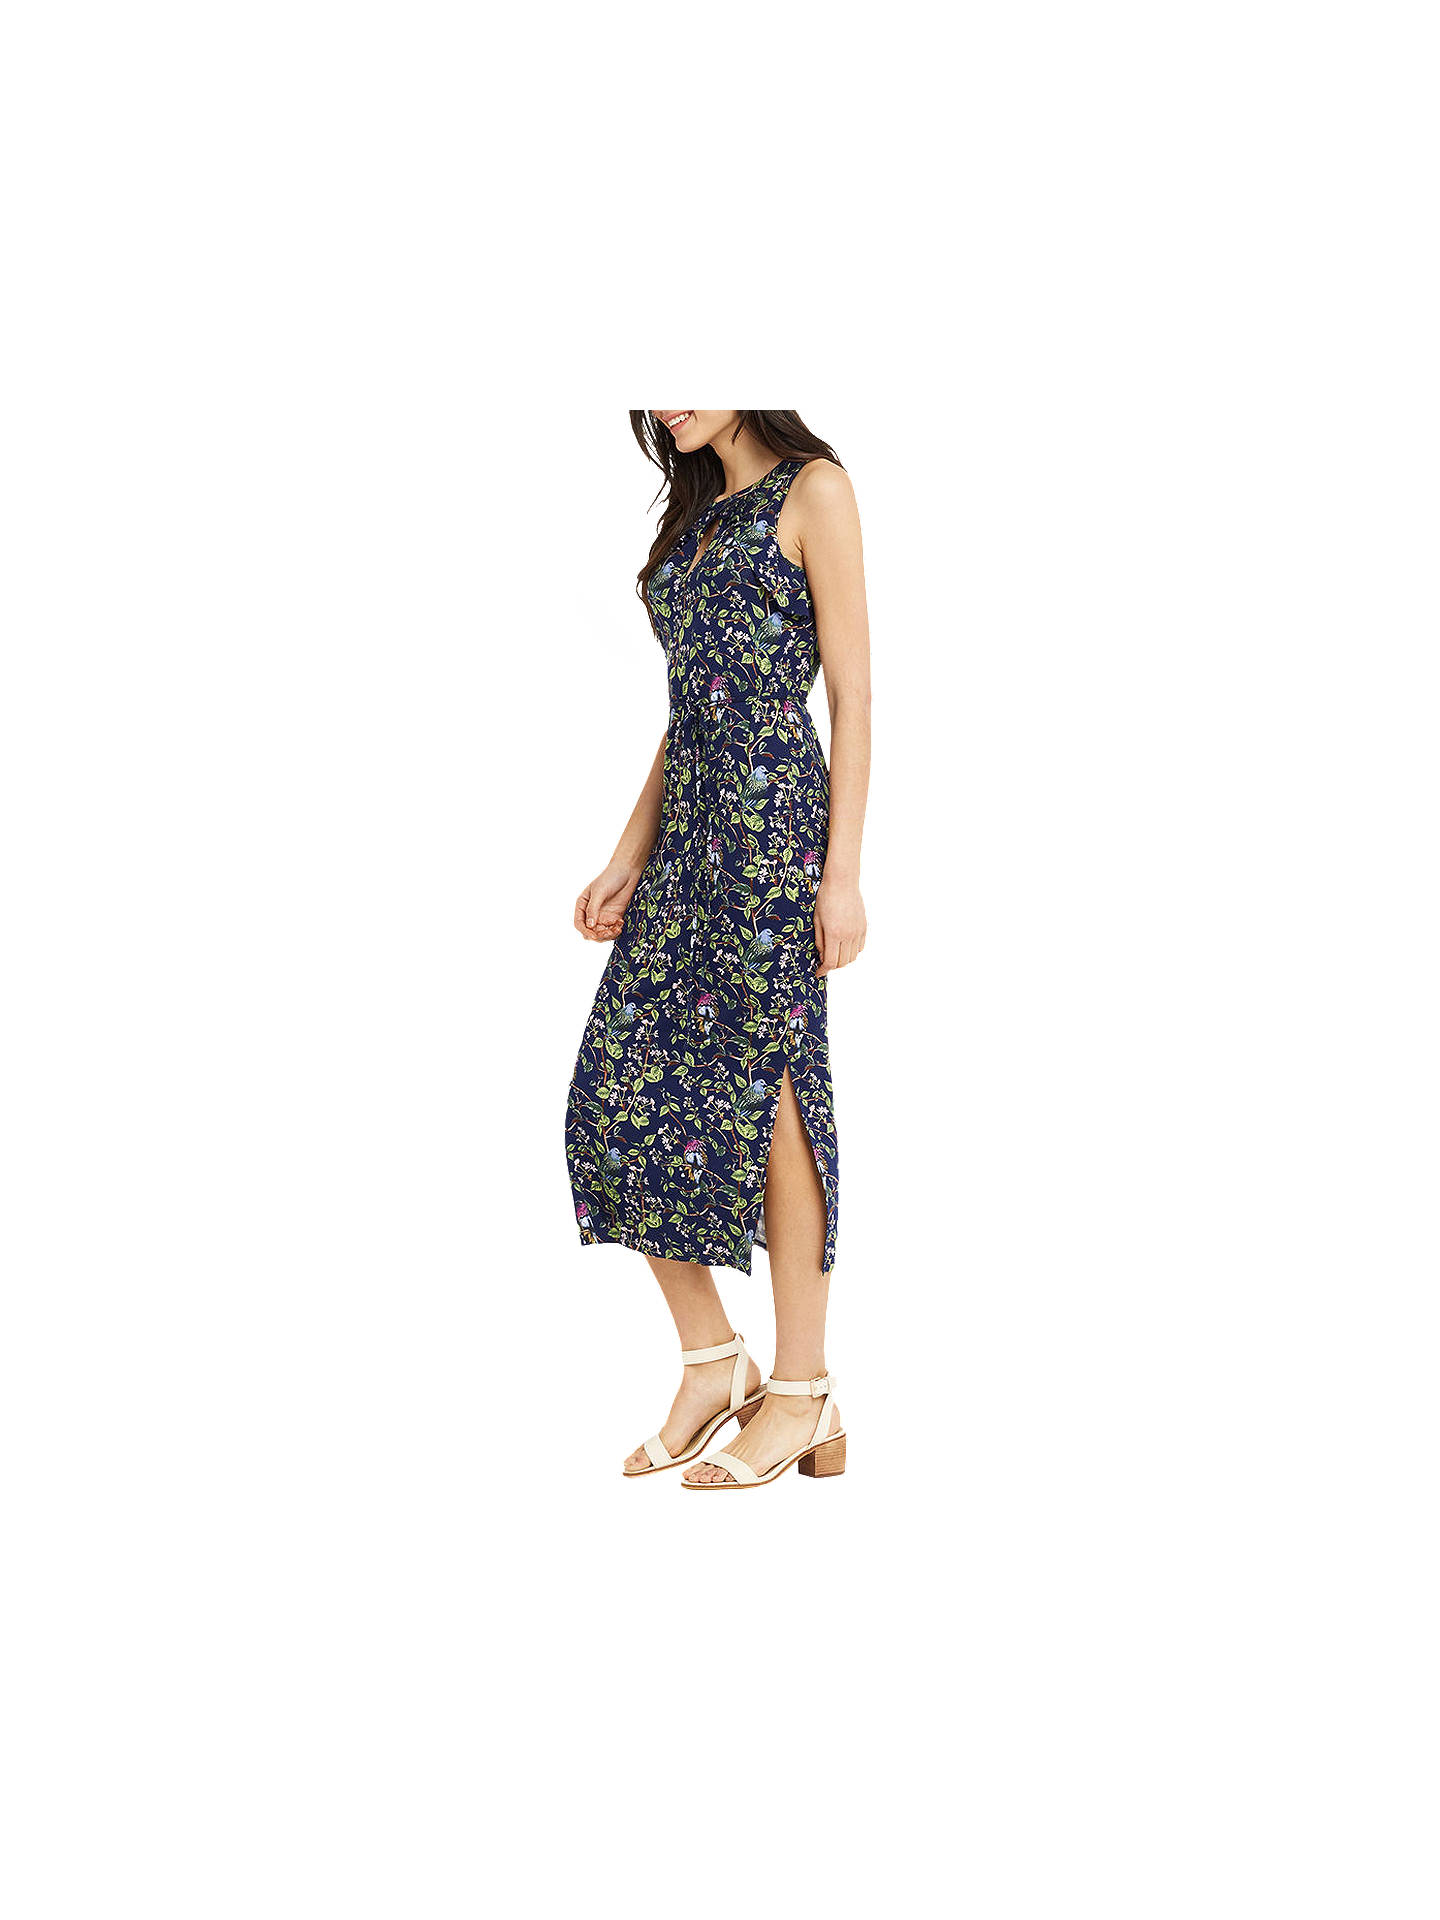 8ef9c02c3188 Buy Oasis Topaz Bird Print Midi Dress, Navy, XS Online at johnlewis.com ...